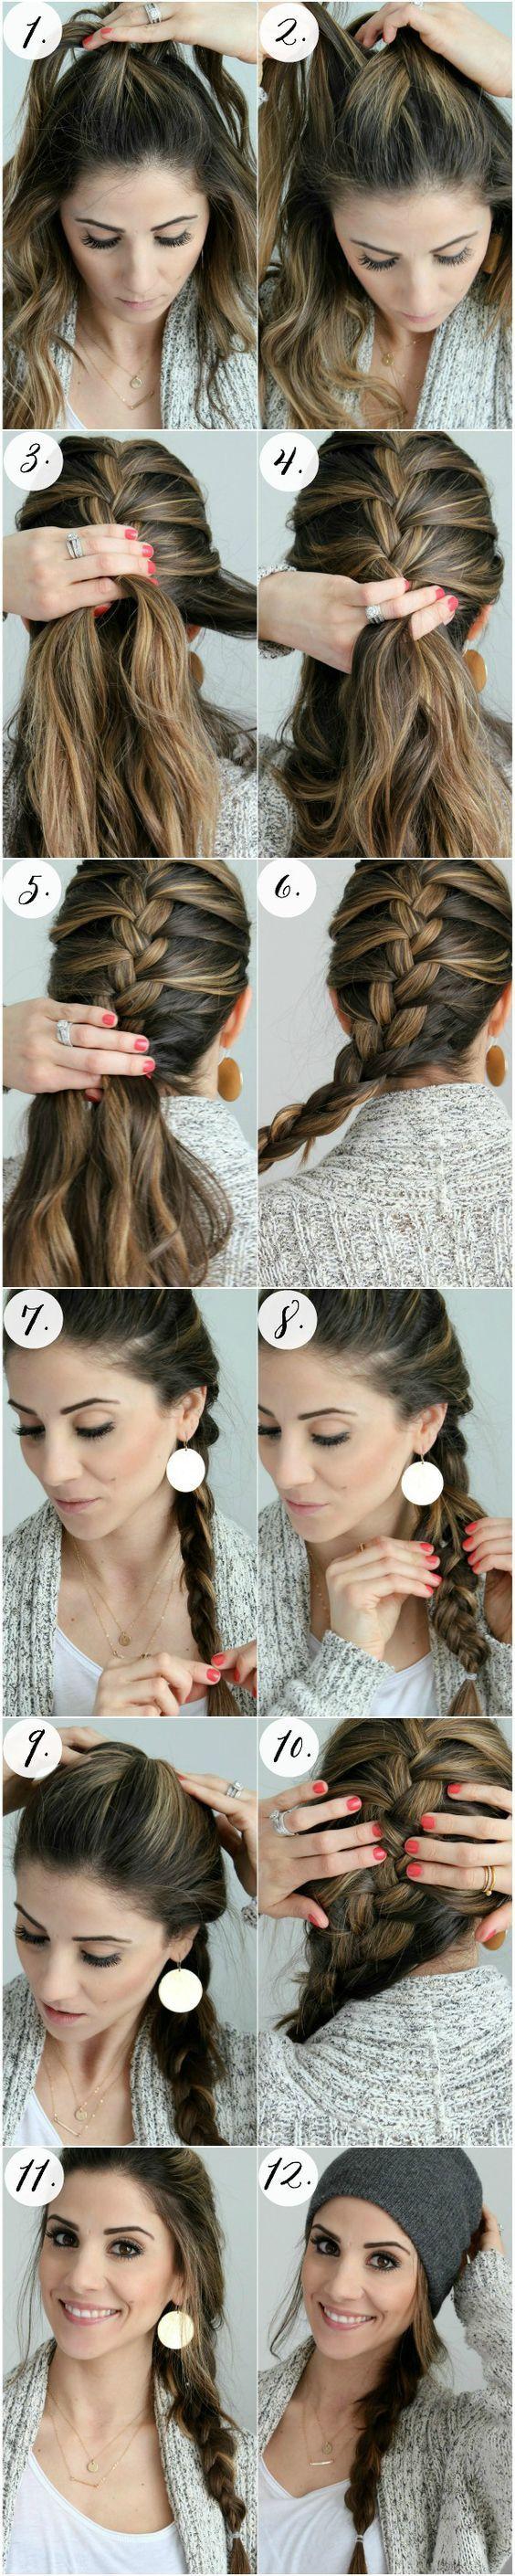 Simple french braid tutorial braid tutorials french plait and